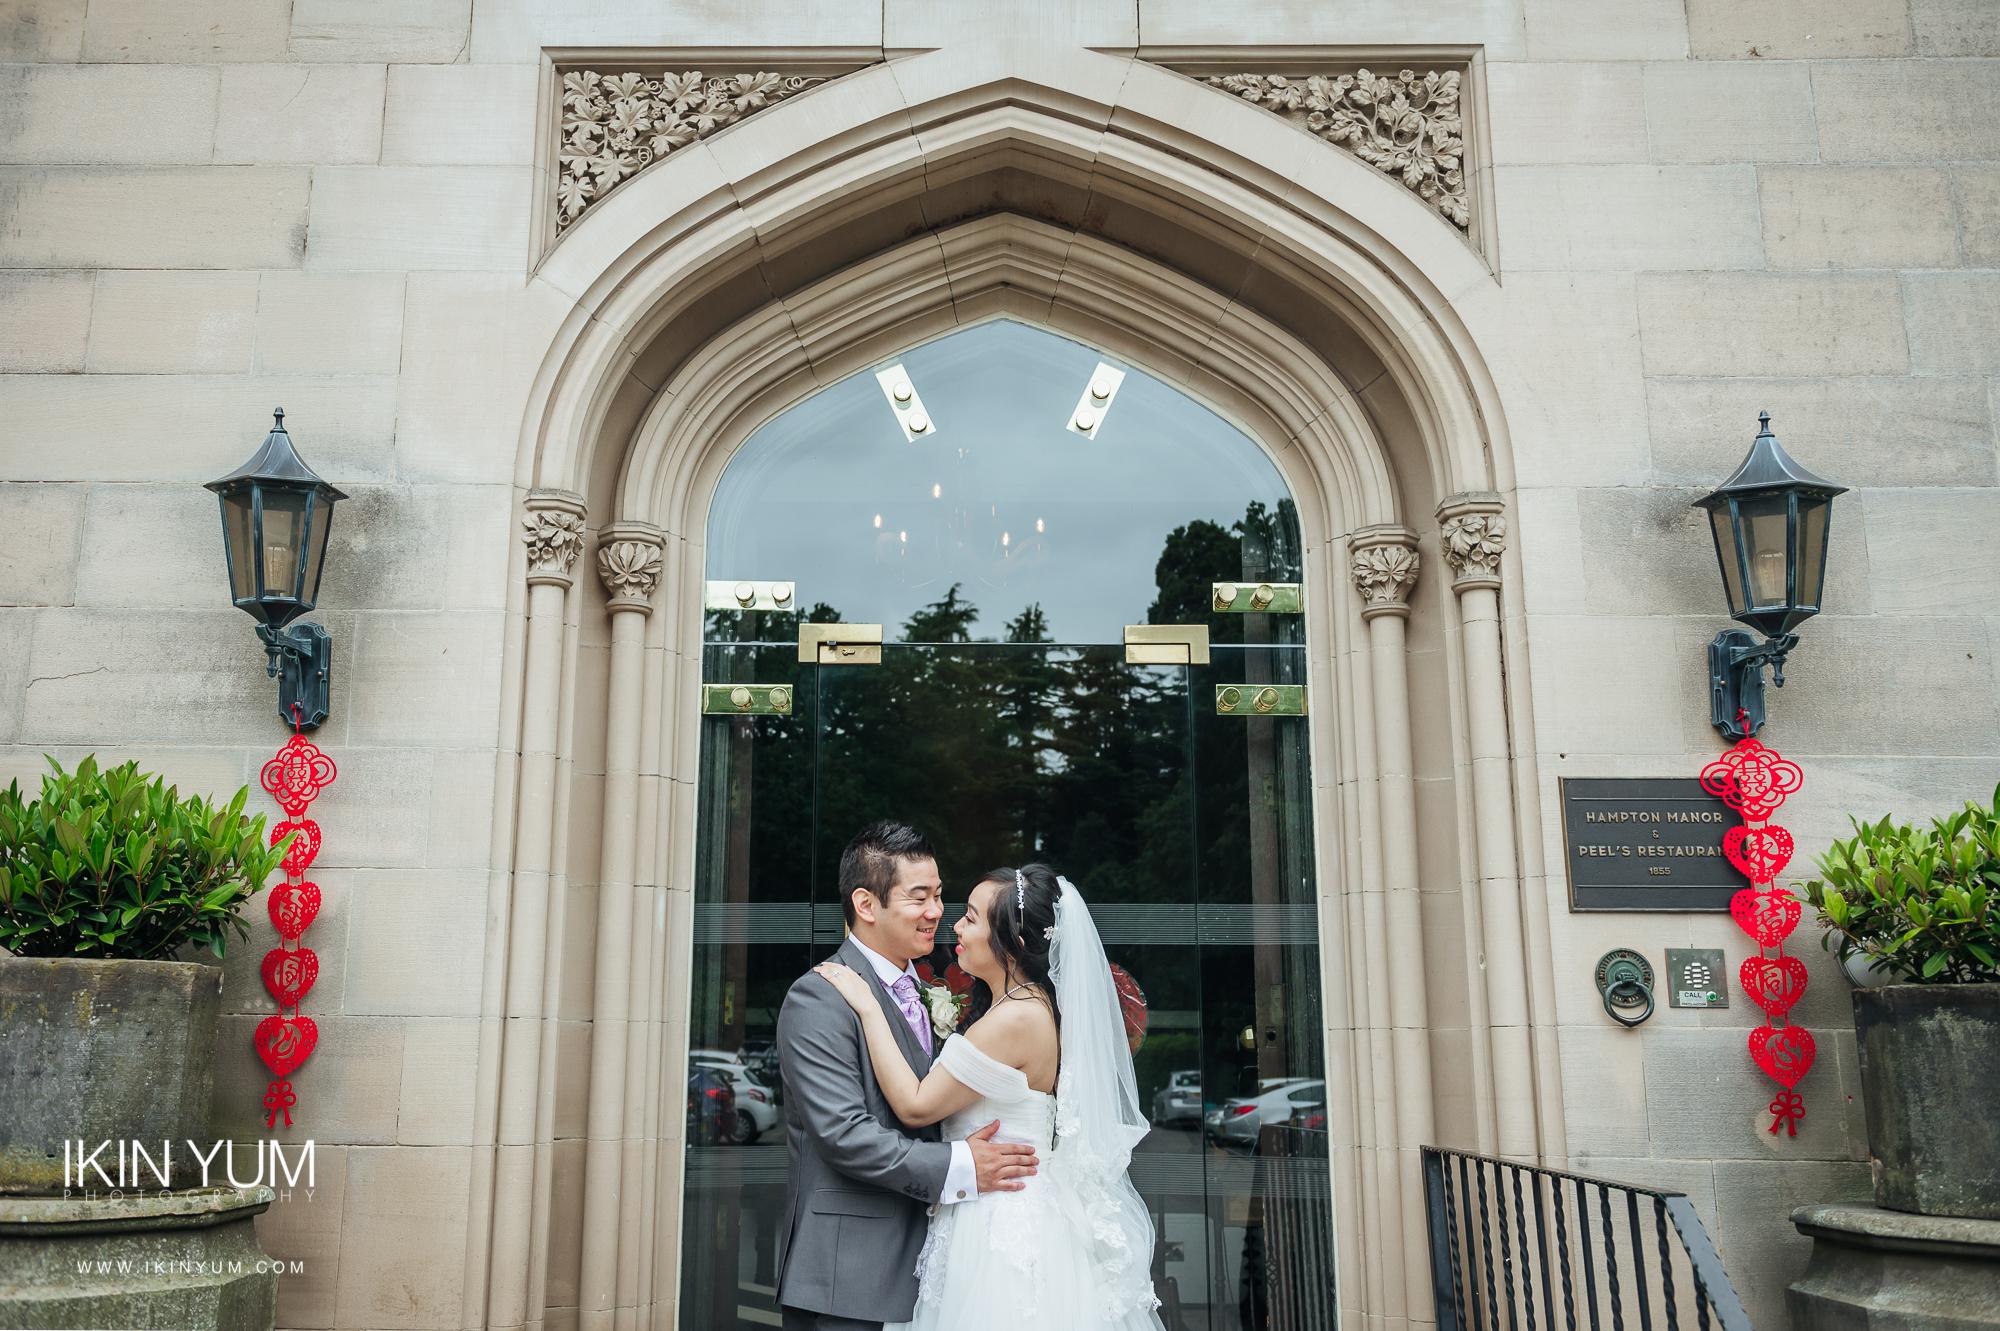 Hampton Manor Wedding - Ikin Yum Photography -117.jpg